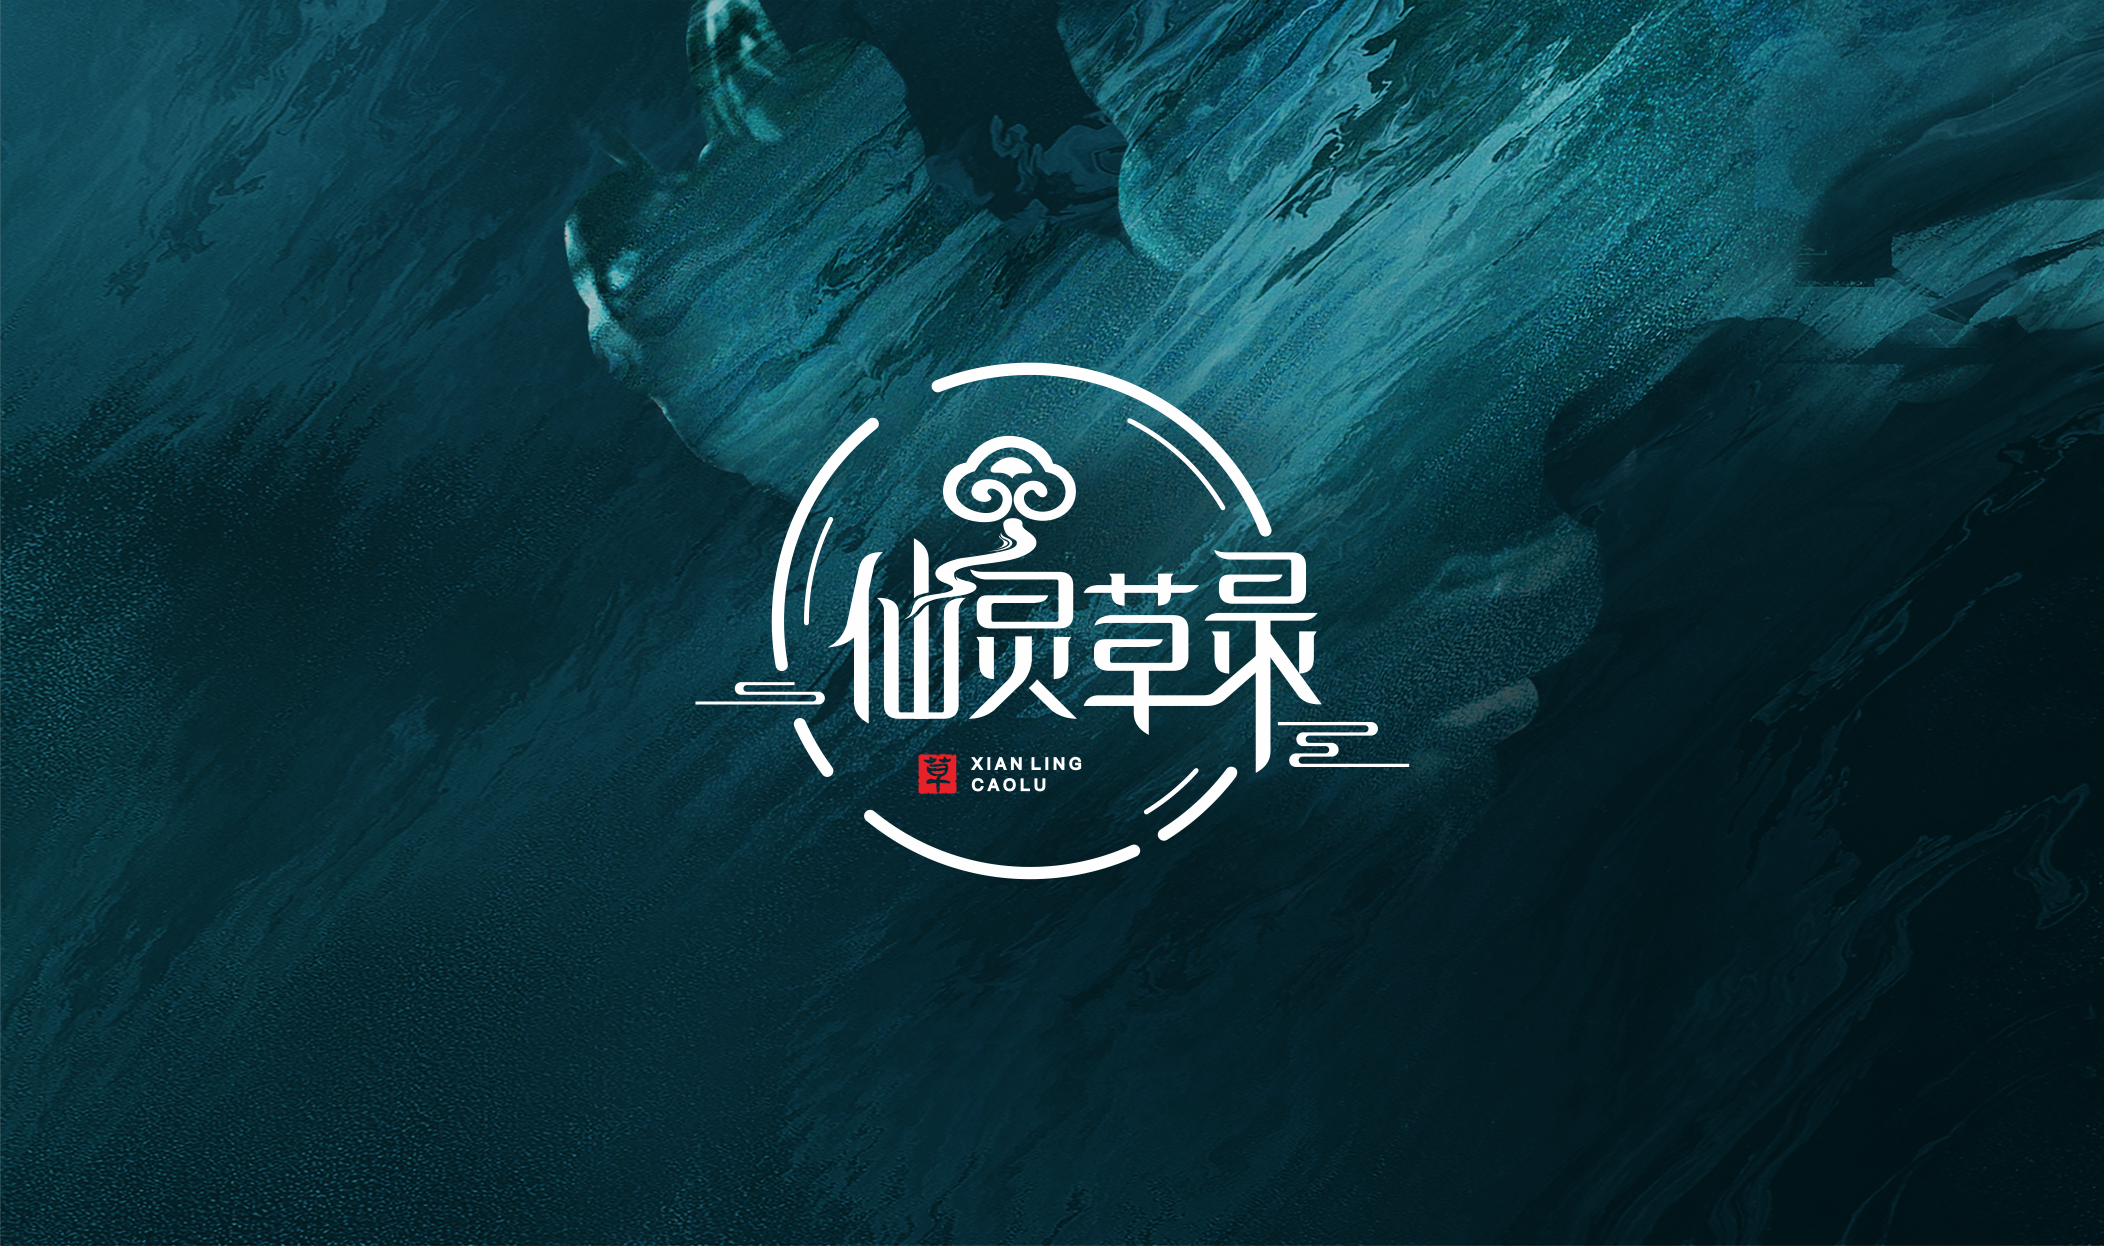 【LOGO设计】企业logo门店logo商标卡通手绘餐饮品牌